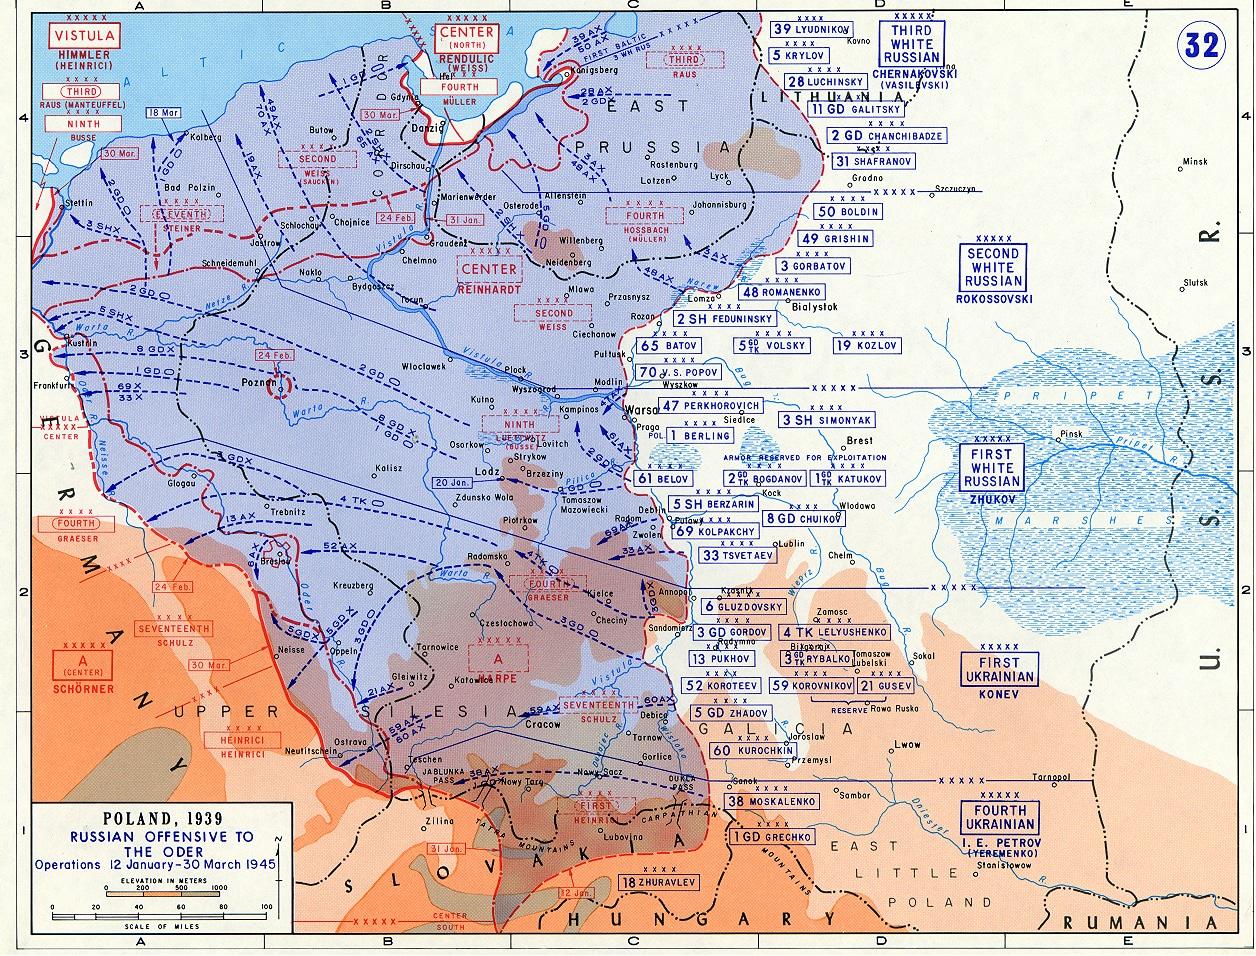 The Vistula-Oder Campaign